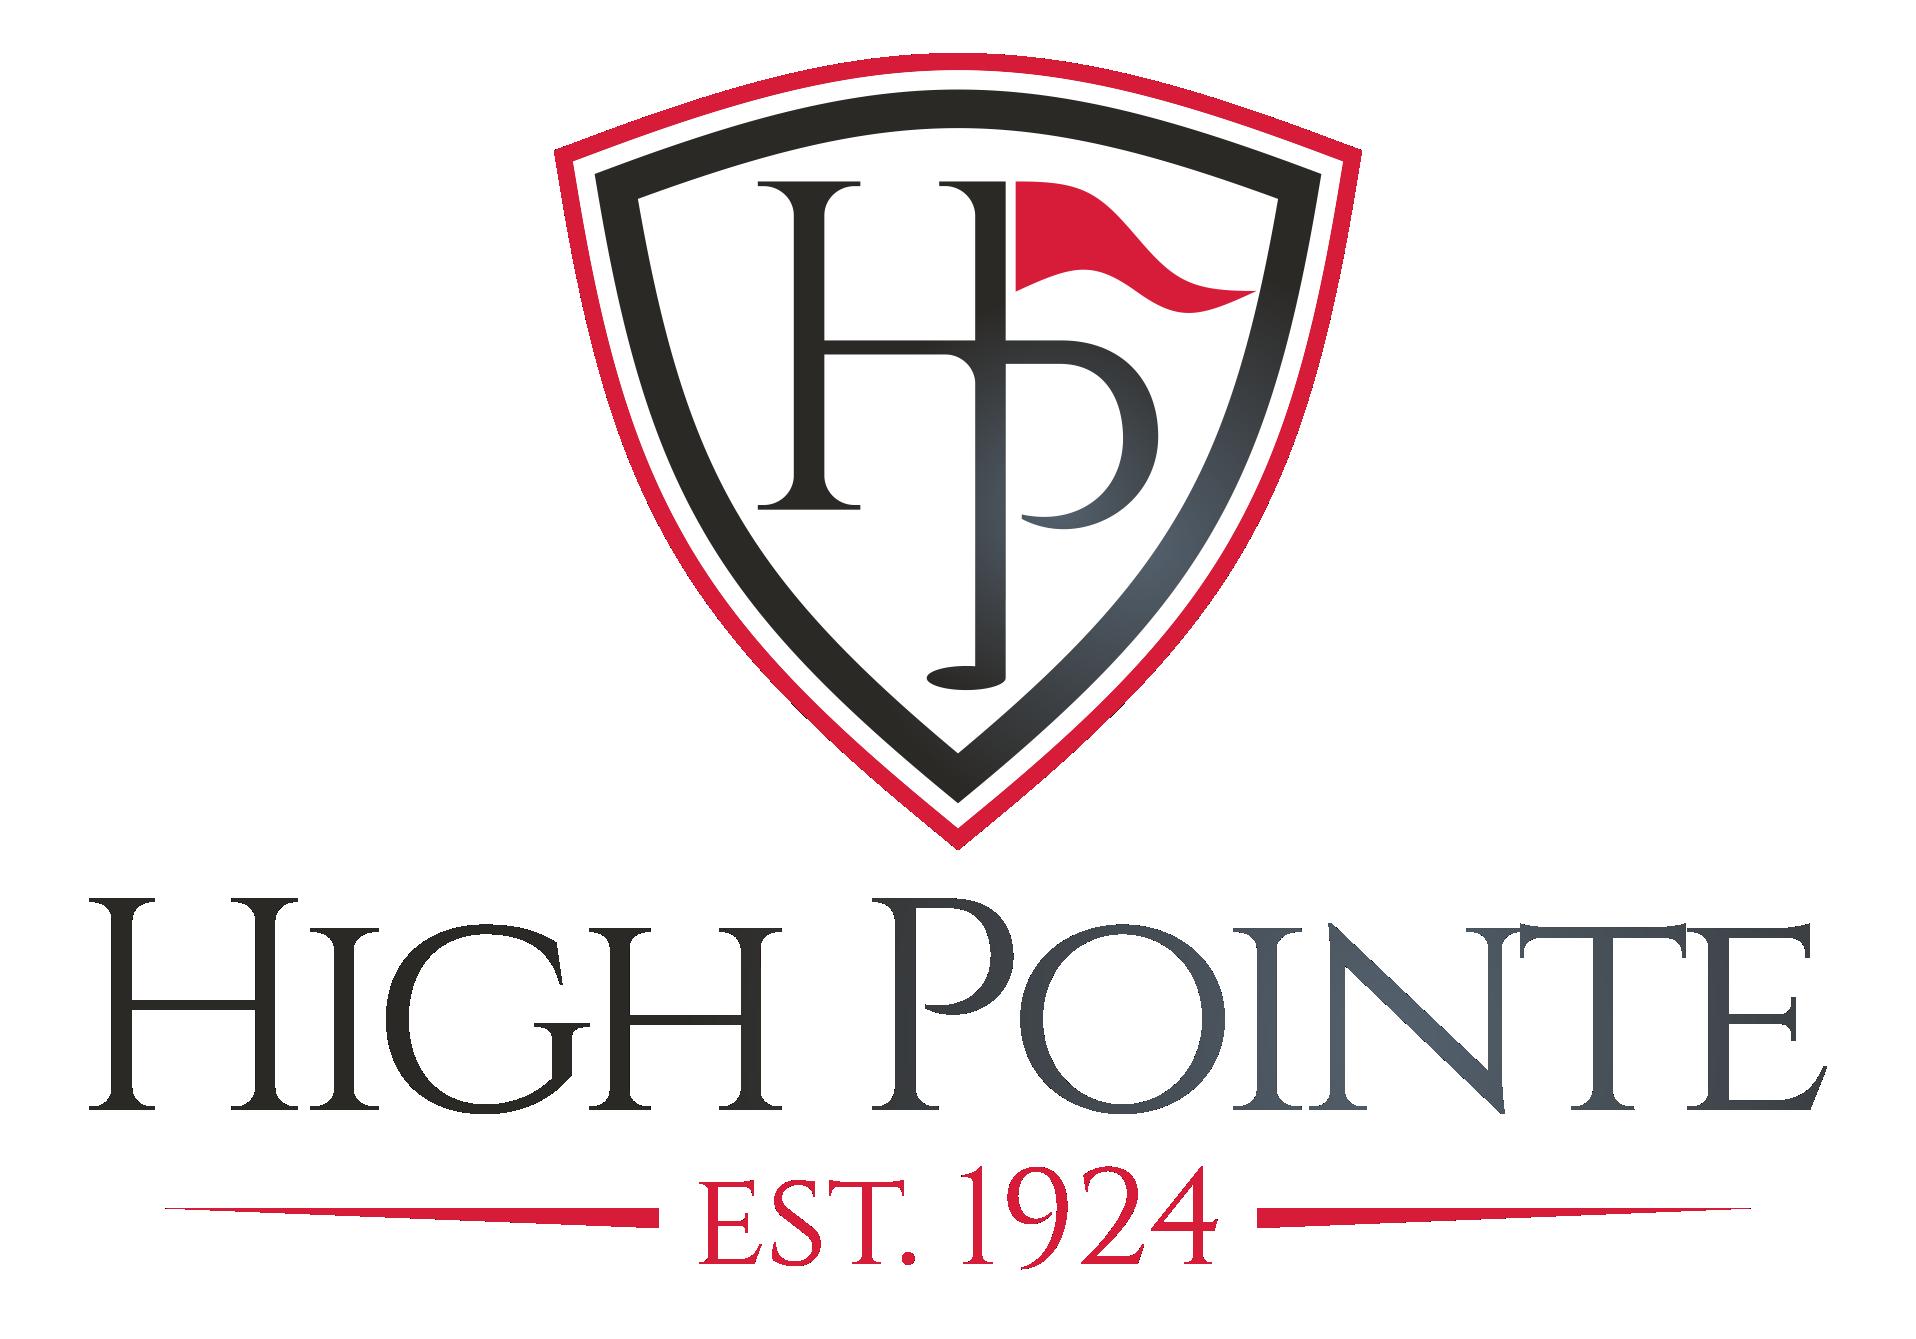 High Pointe Country Club